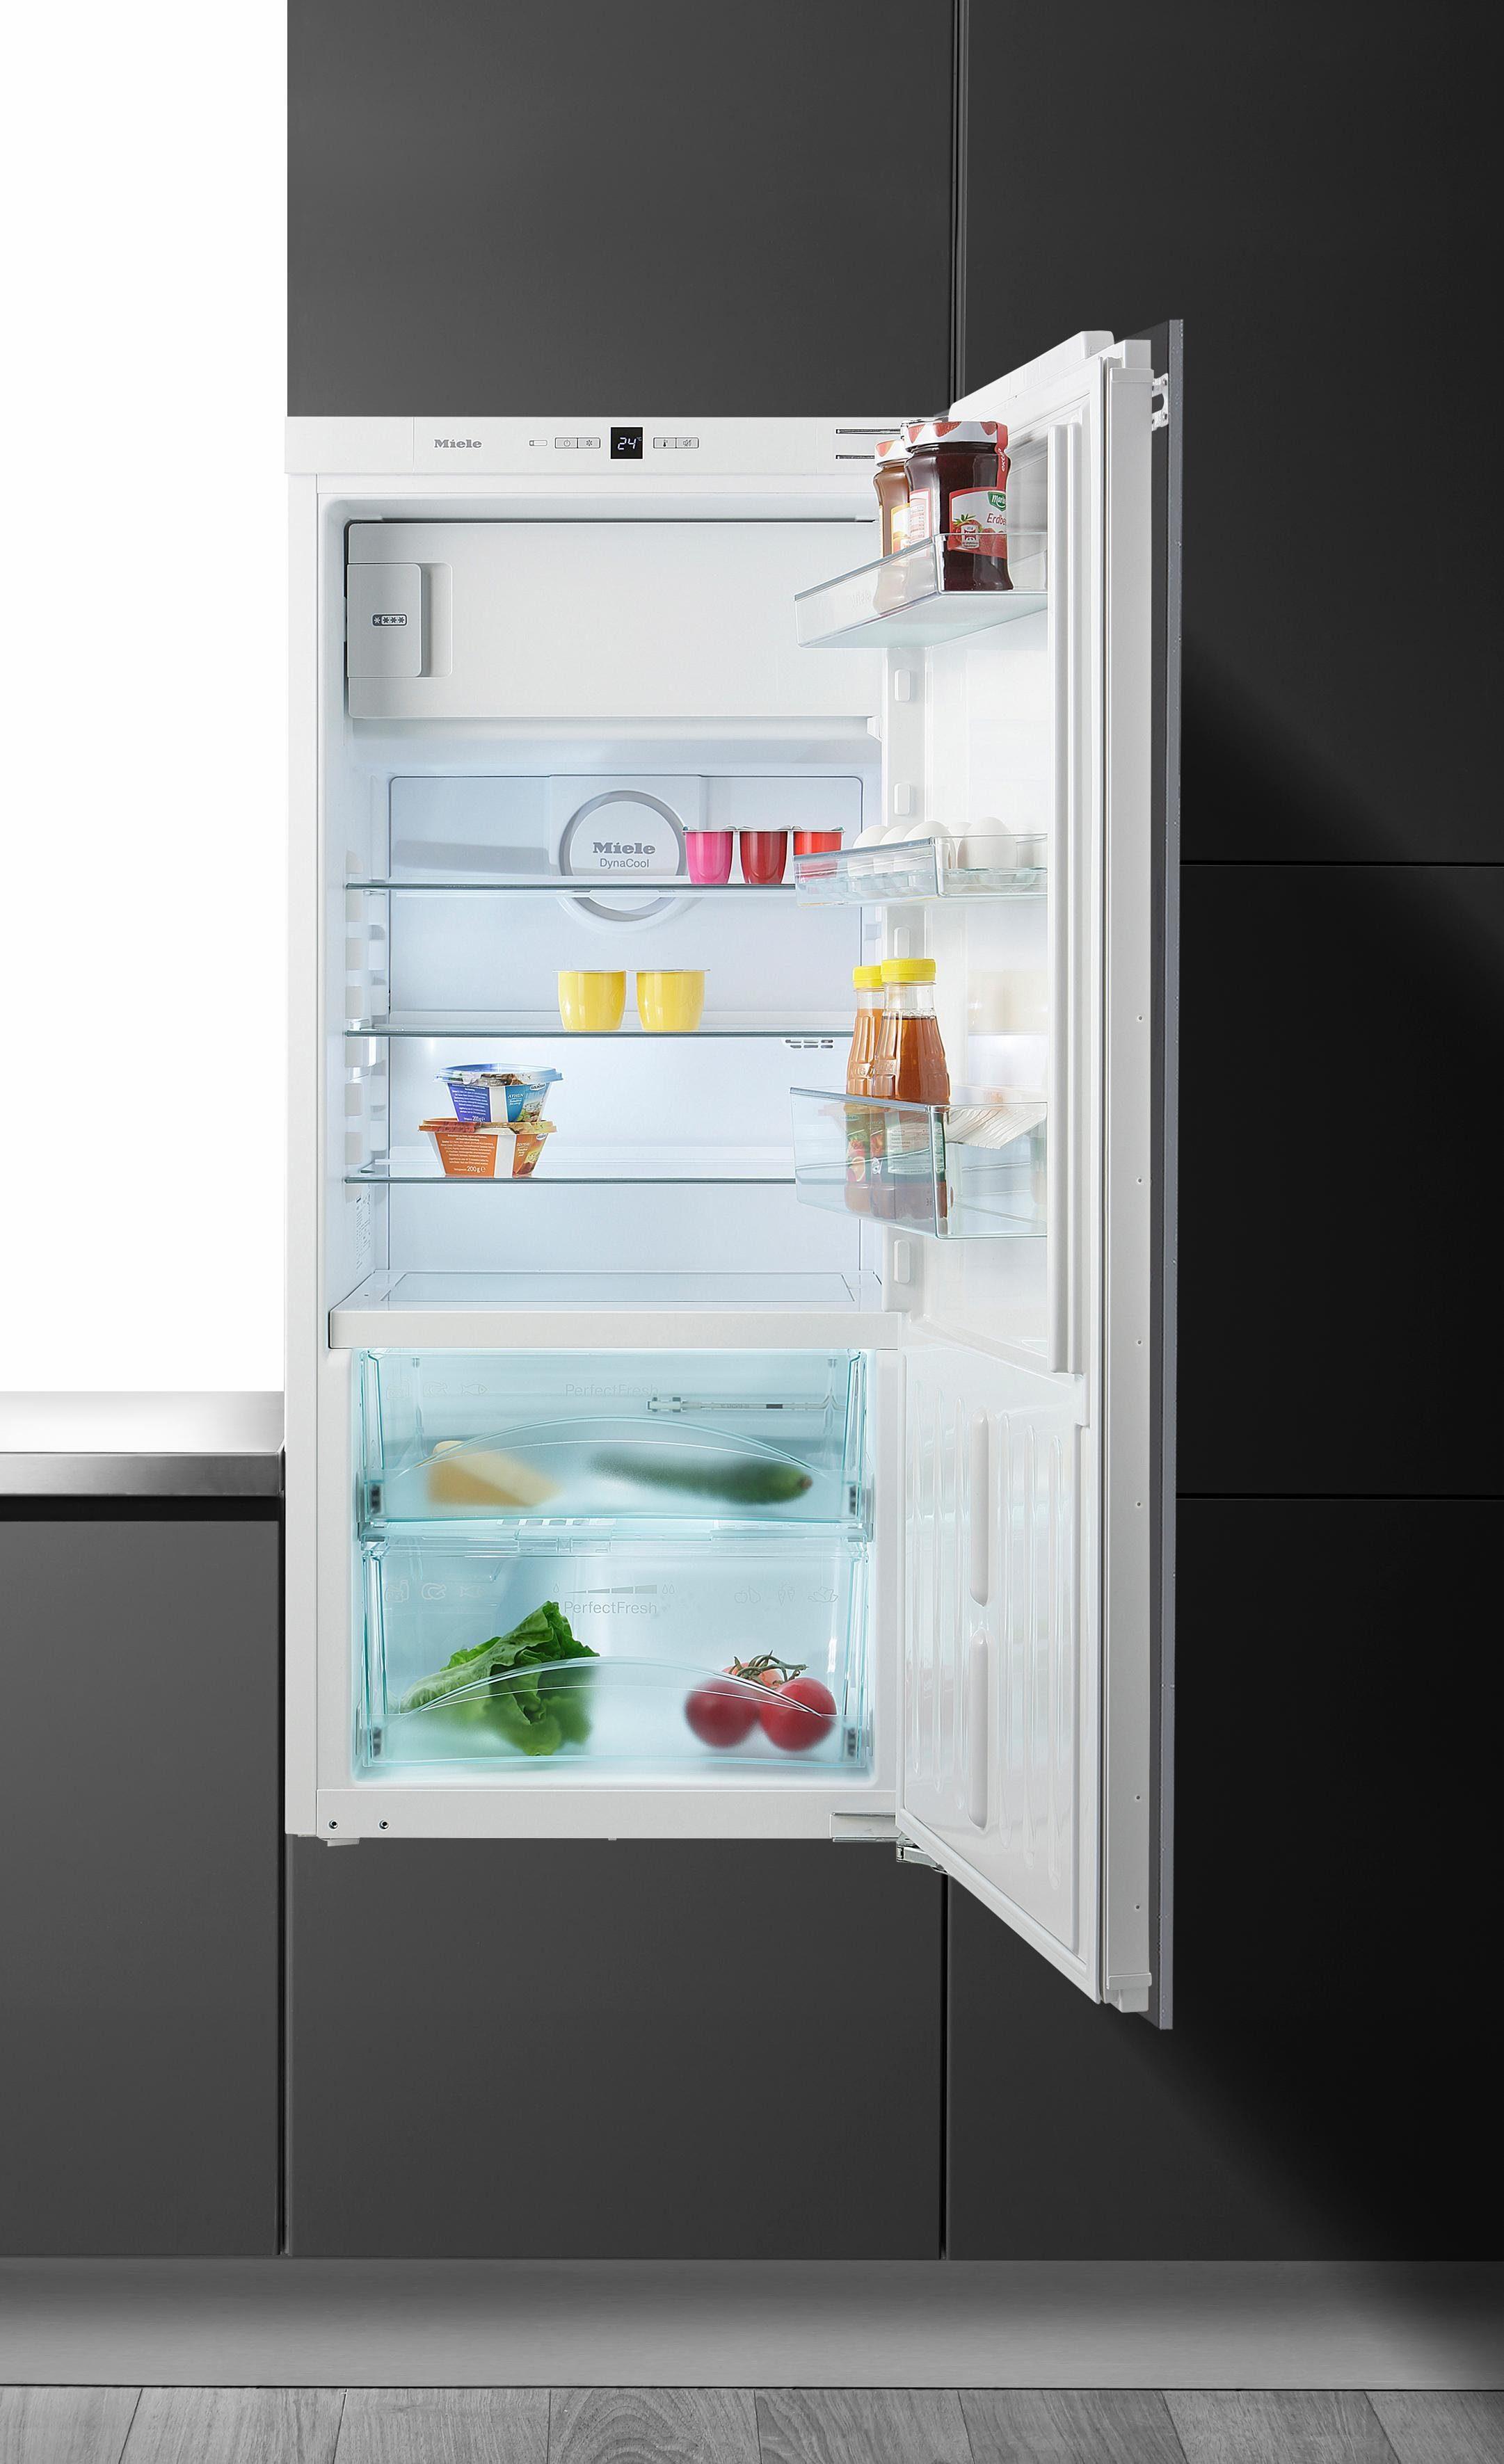 Miele integrierbarer Einbau-Kühlschrank K 34282 iDF, A++, 121,8 cm